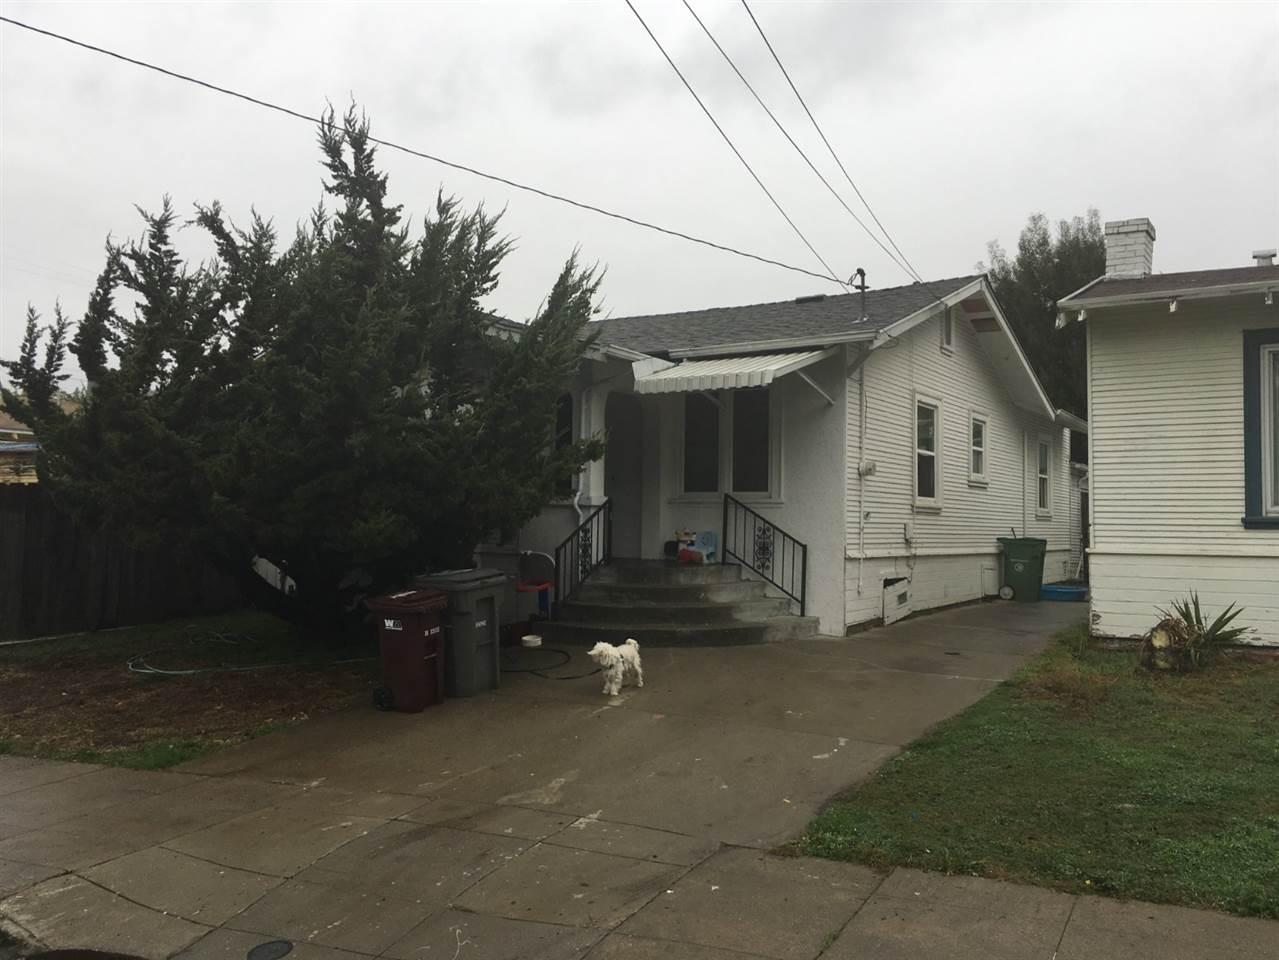 Single Family Home for Sale at 8366 Iris Street 8366 Iris Street Oakland, California 94605 United States